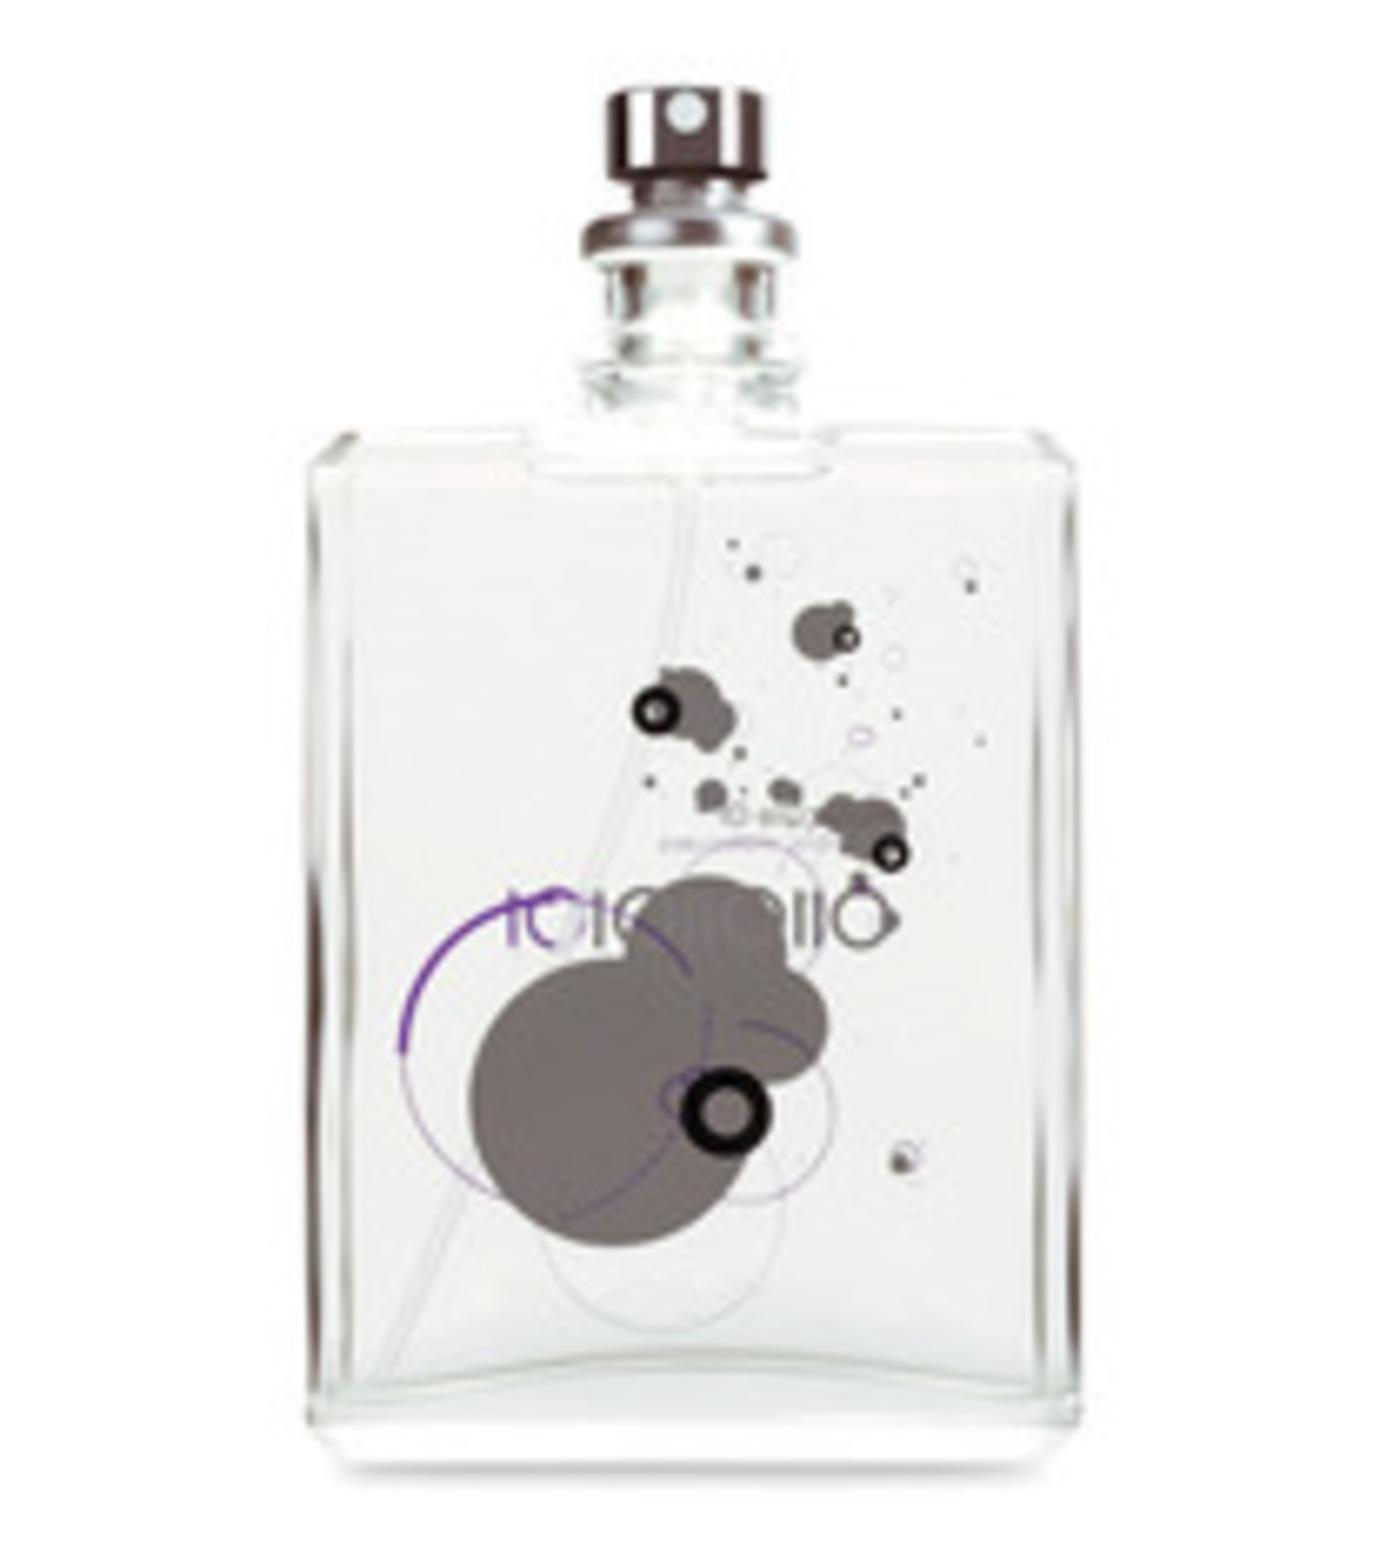 Escentric Molecules(エセントリック・モレキュールズ)のMolecule 01 100ml-NONE(FRAGRANCE-GROOMING/フレグランス/FRAGRANCE-GROOMING/fragrance)-110-EMM-0130 拡大詳細画像1